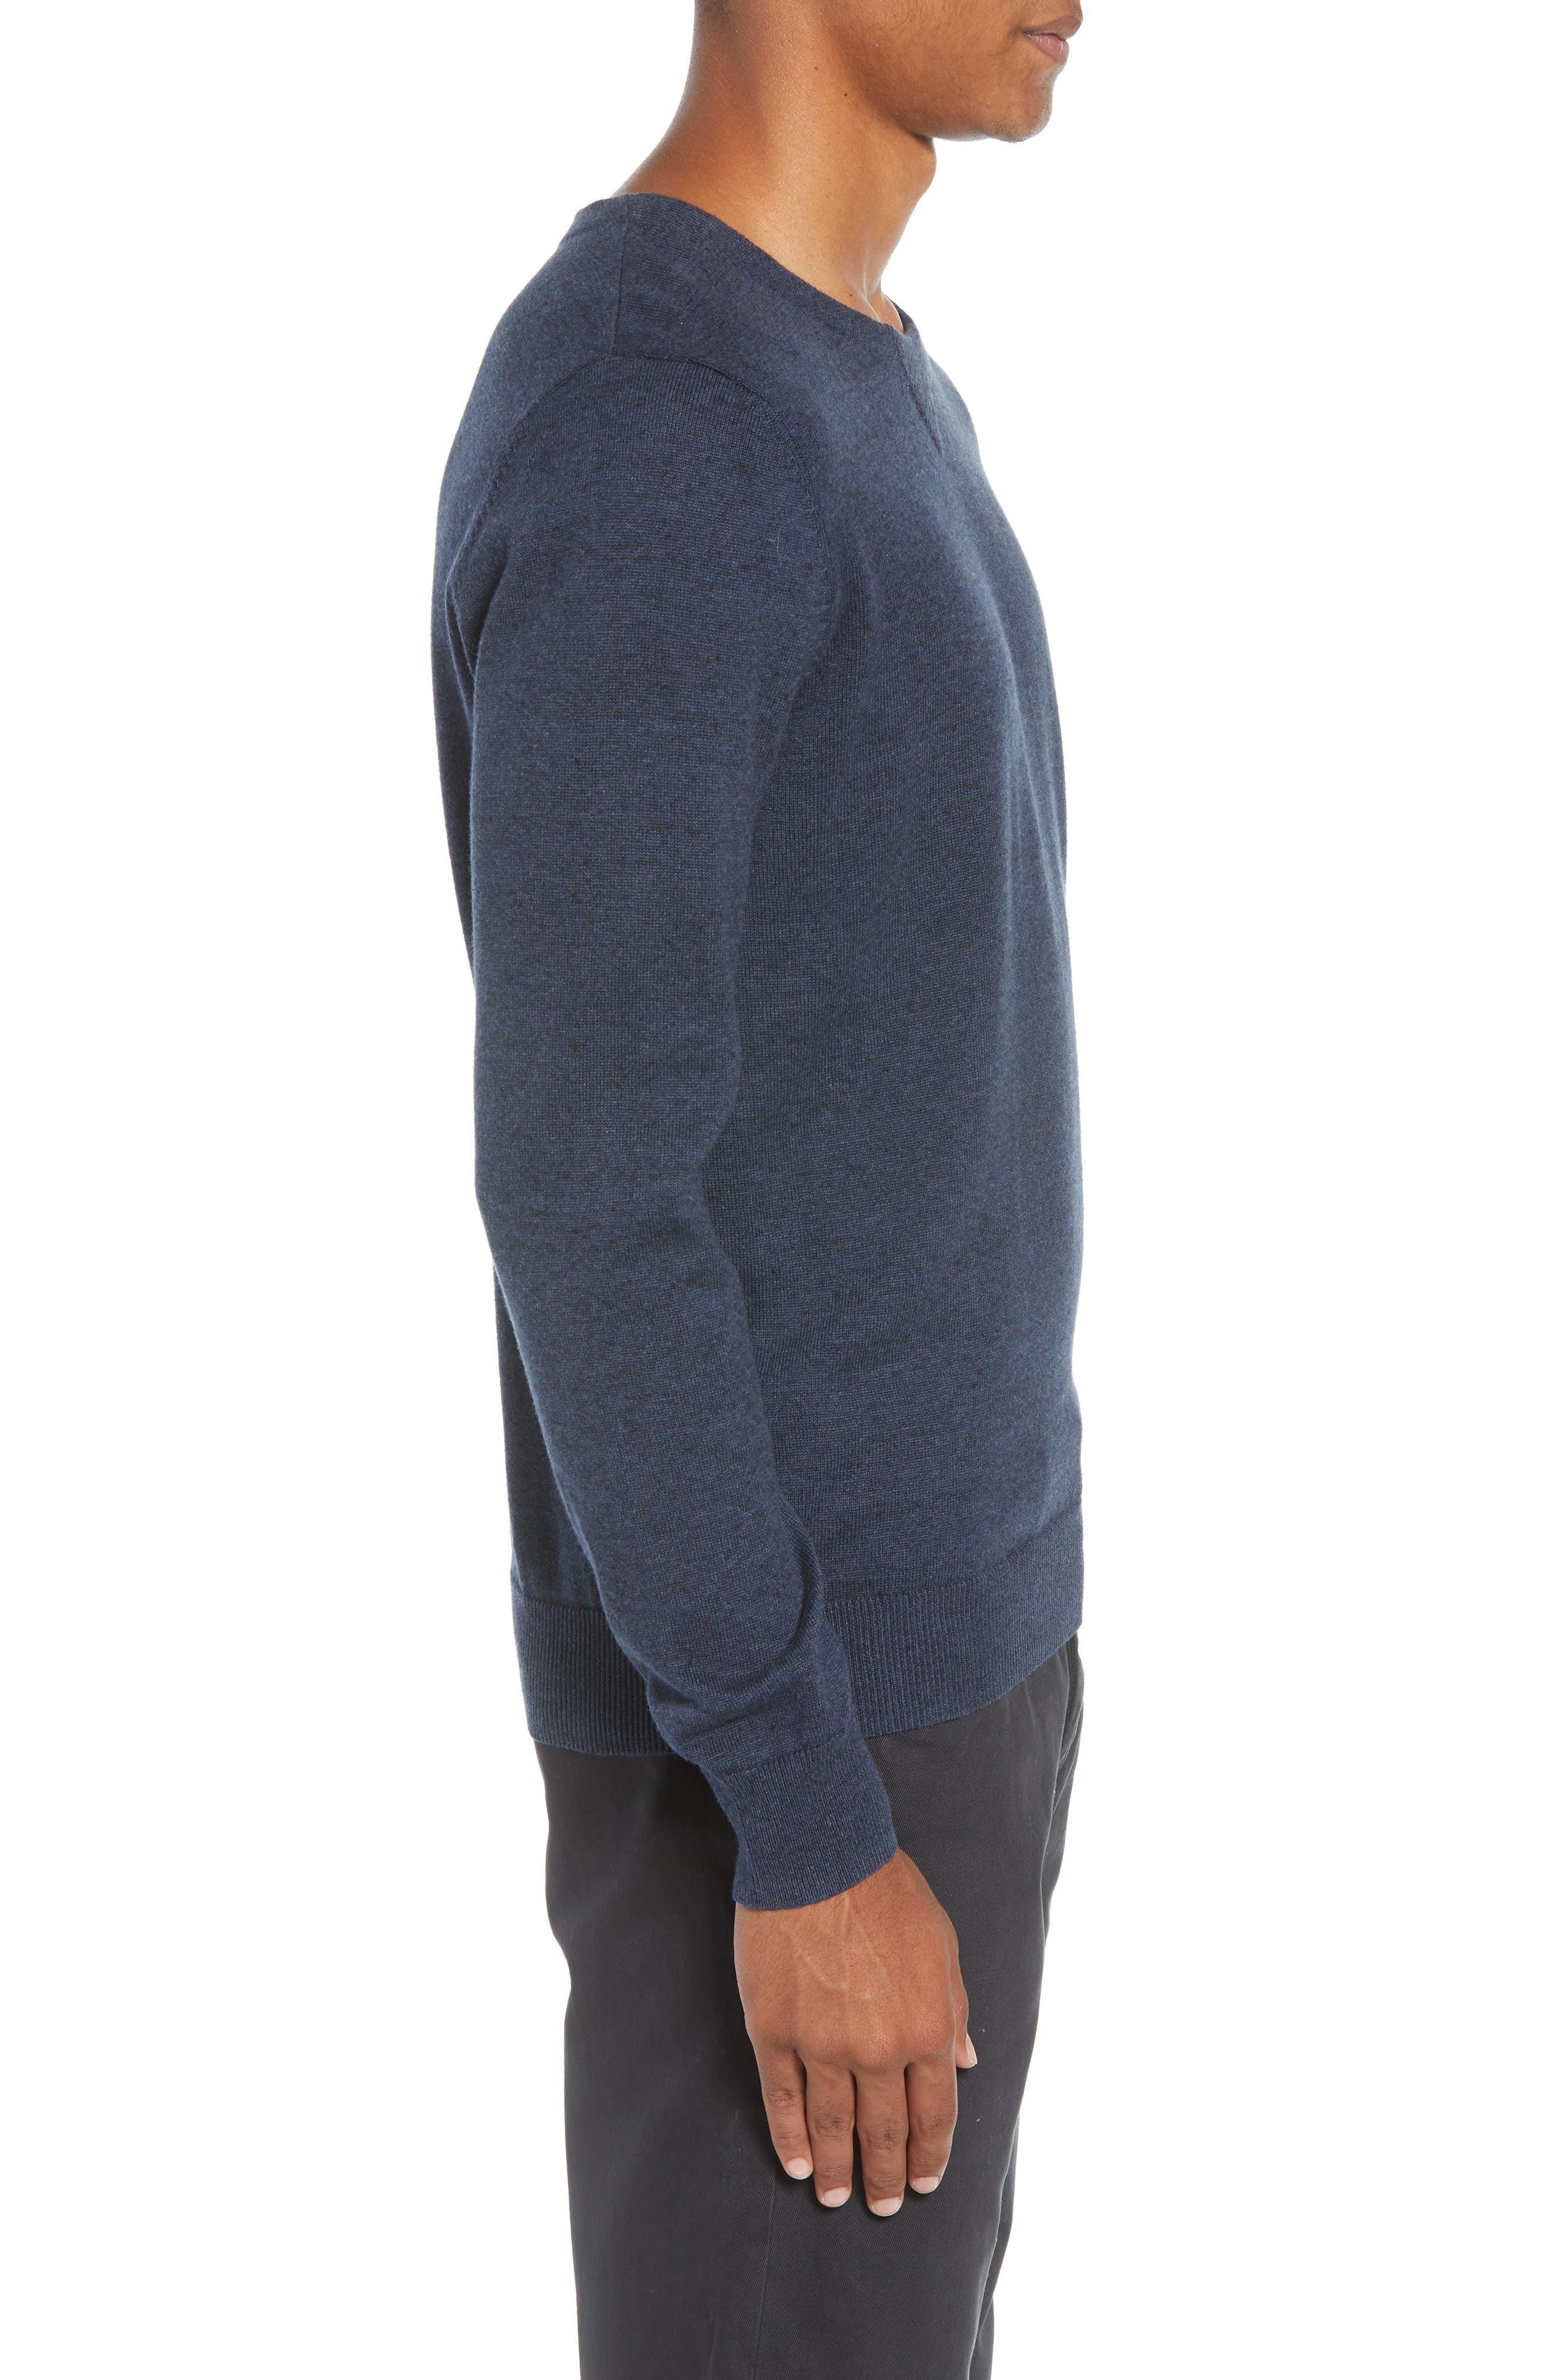 McGill Slim Fit Crewneck Sweater,                             Alternate thumbnail 3, color,                             HEATHER NAVY